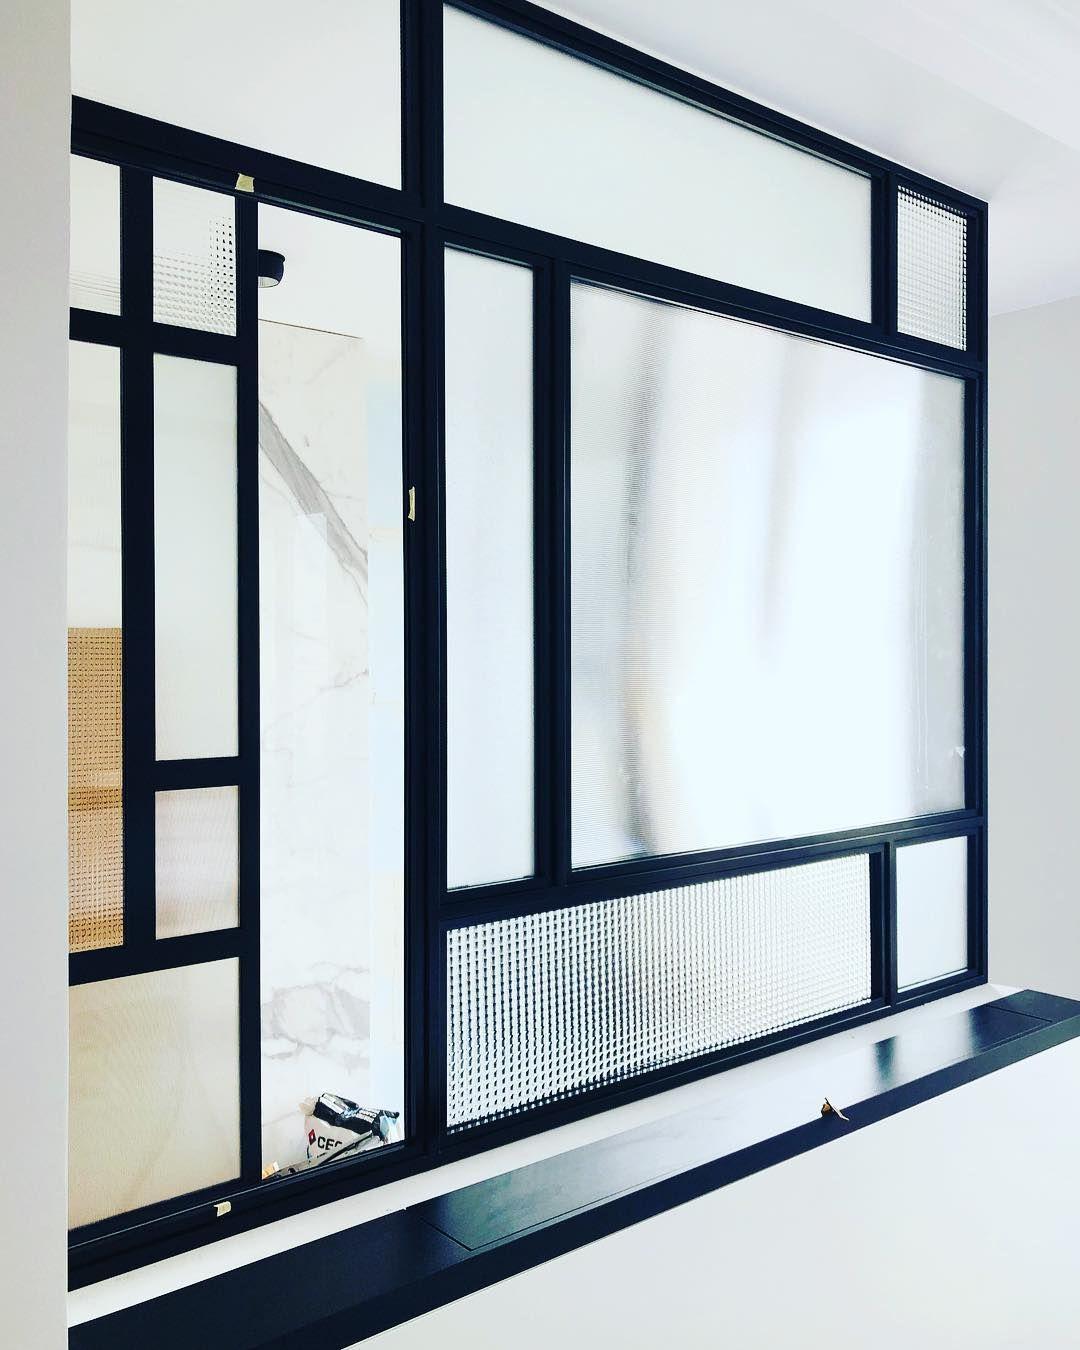 S D On Instagram Projet De Duplex Villedeneuilly Pose De La